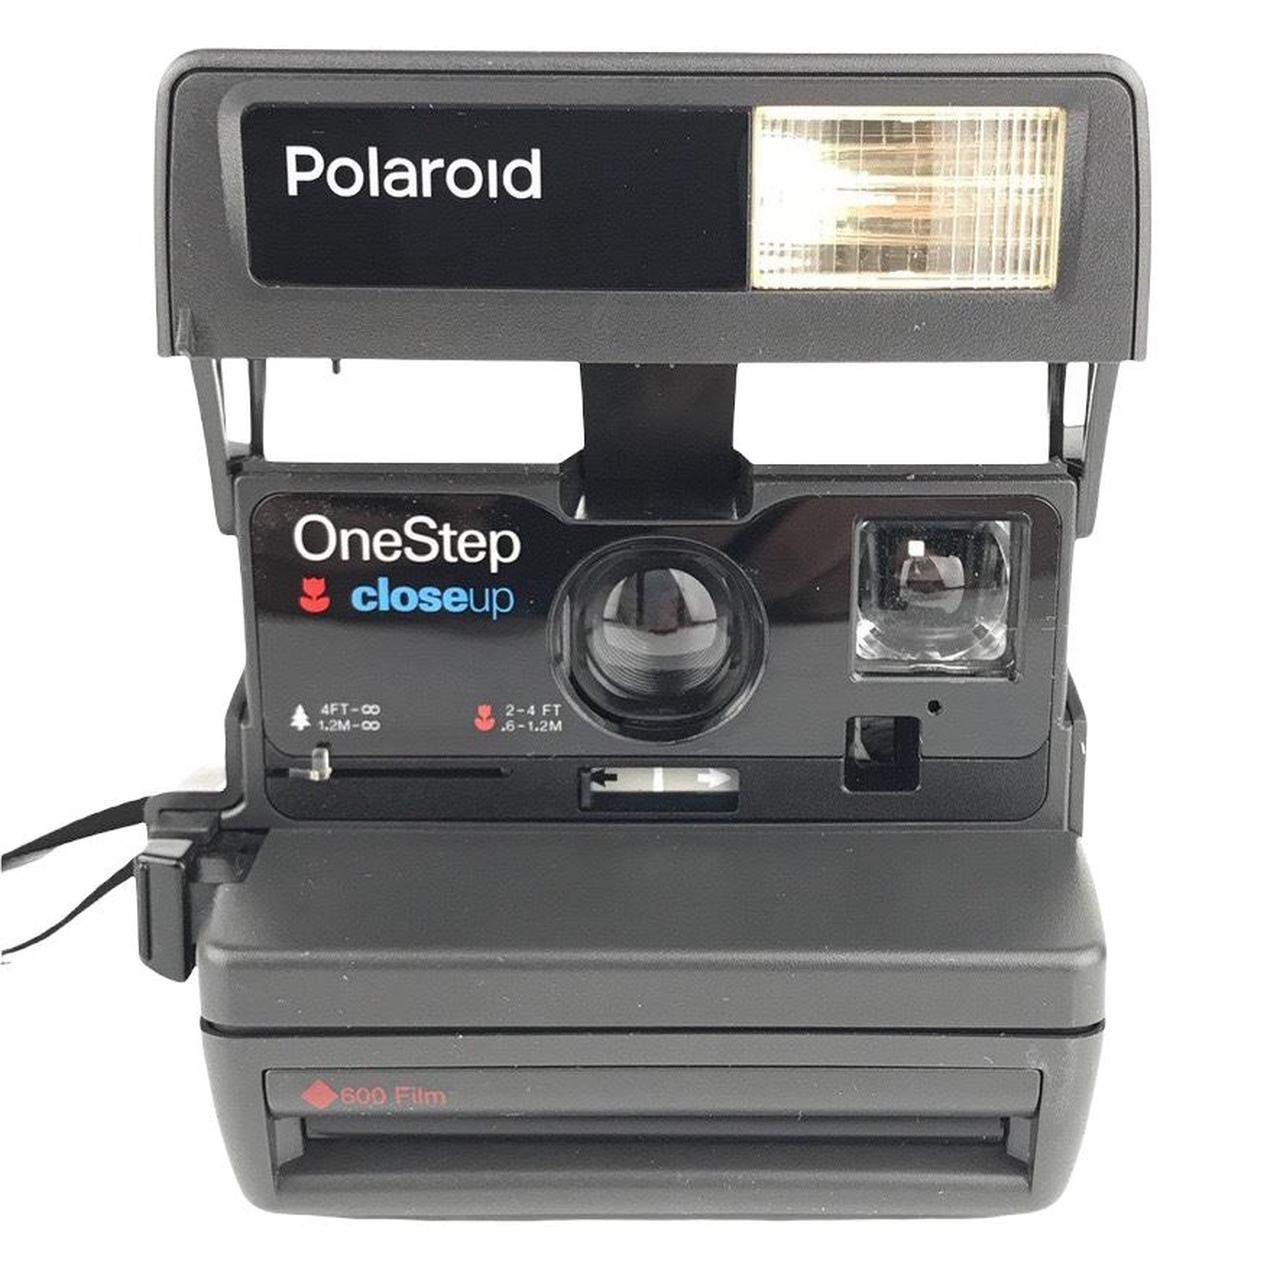 Product Image 1 - Polaroid OneStep CloseUp Film Camera